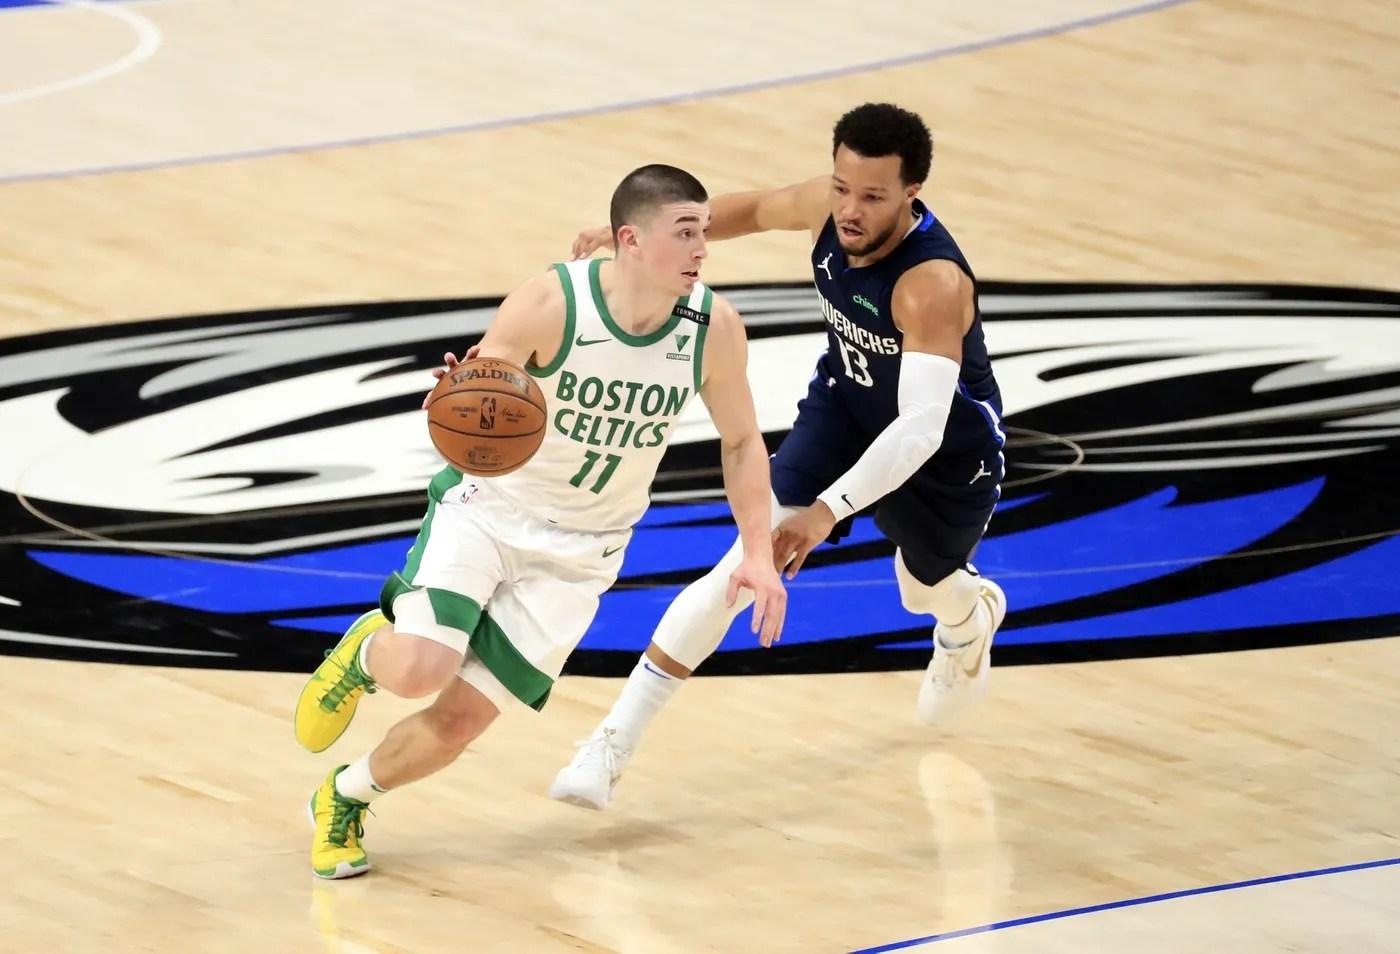 Feb 23, 2021; Dallas, Texas, USA; Boston Celtics guard Payton Pritchard (11) drives to the basket as Dallas Mavericks guard Jalen Brunson (13) defends during the first half at American Airlines Center.